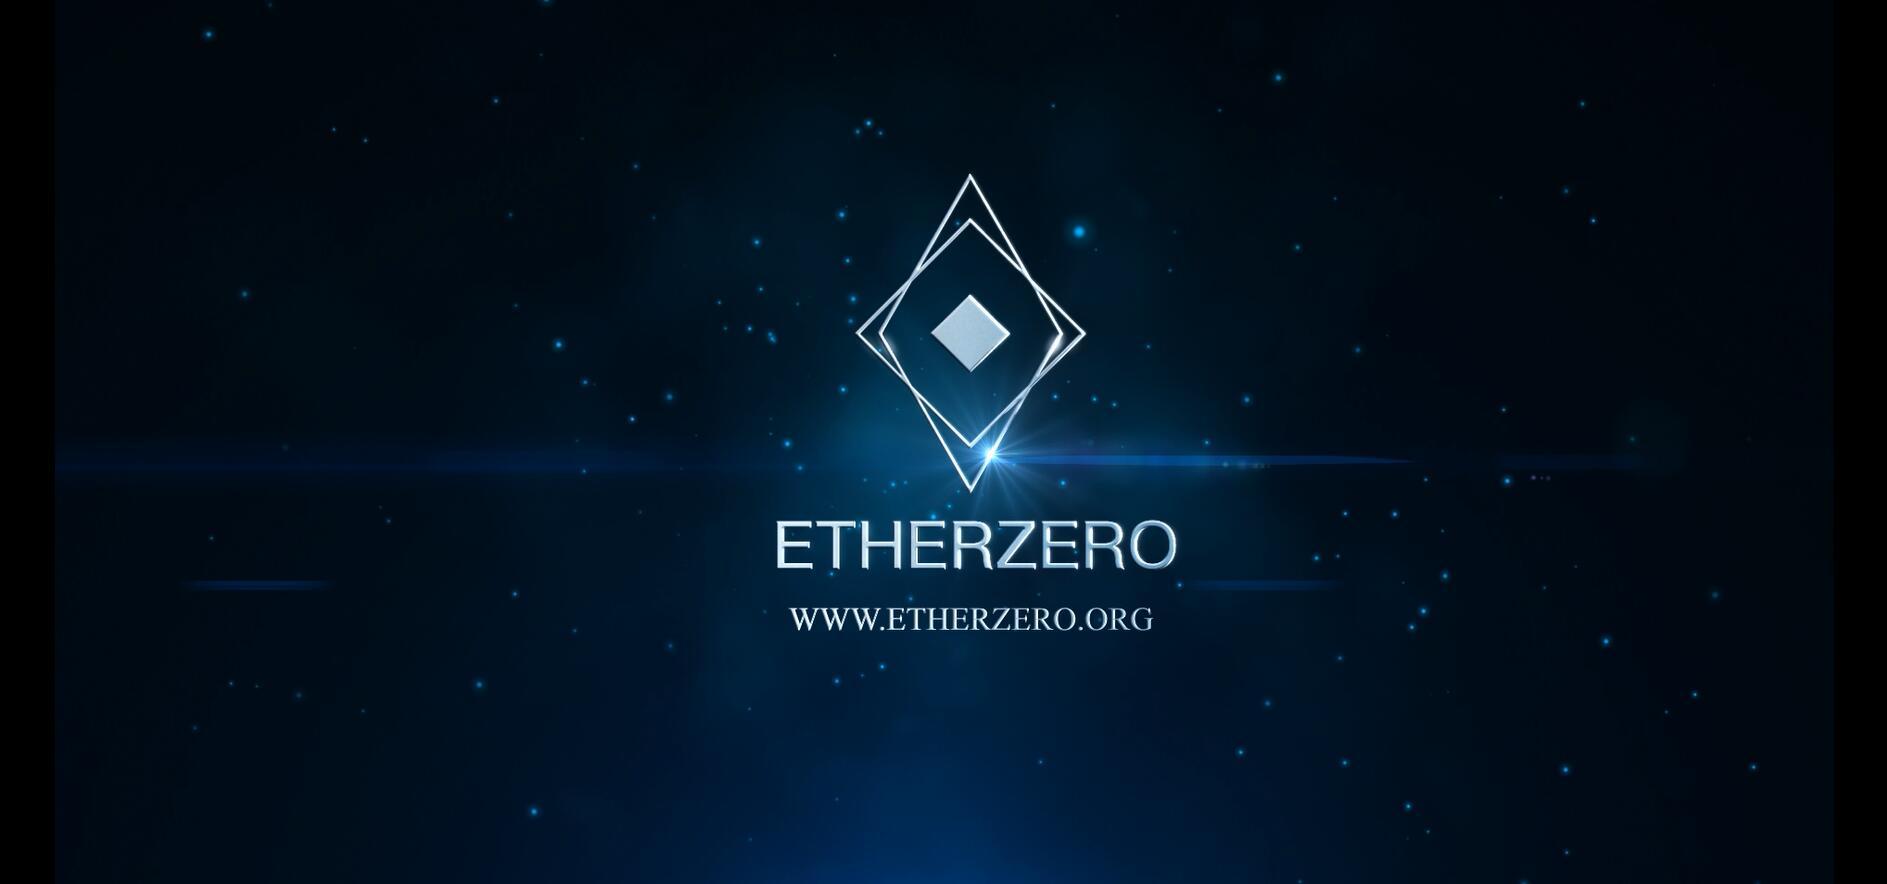 etherzero